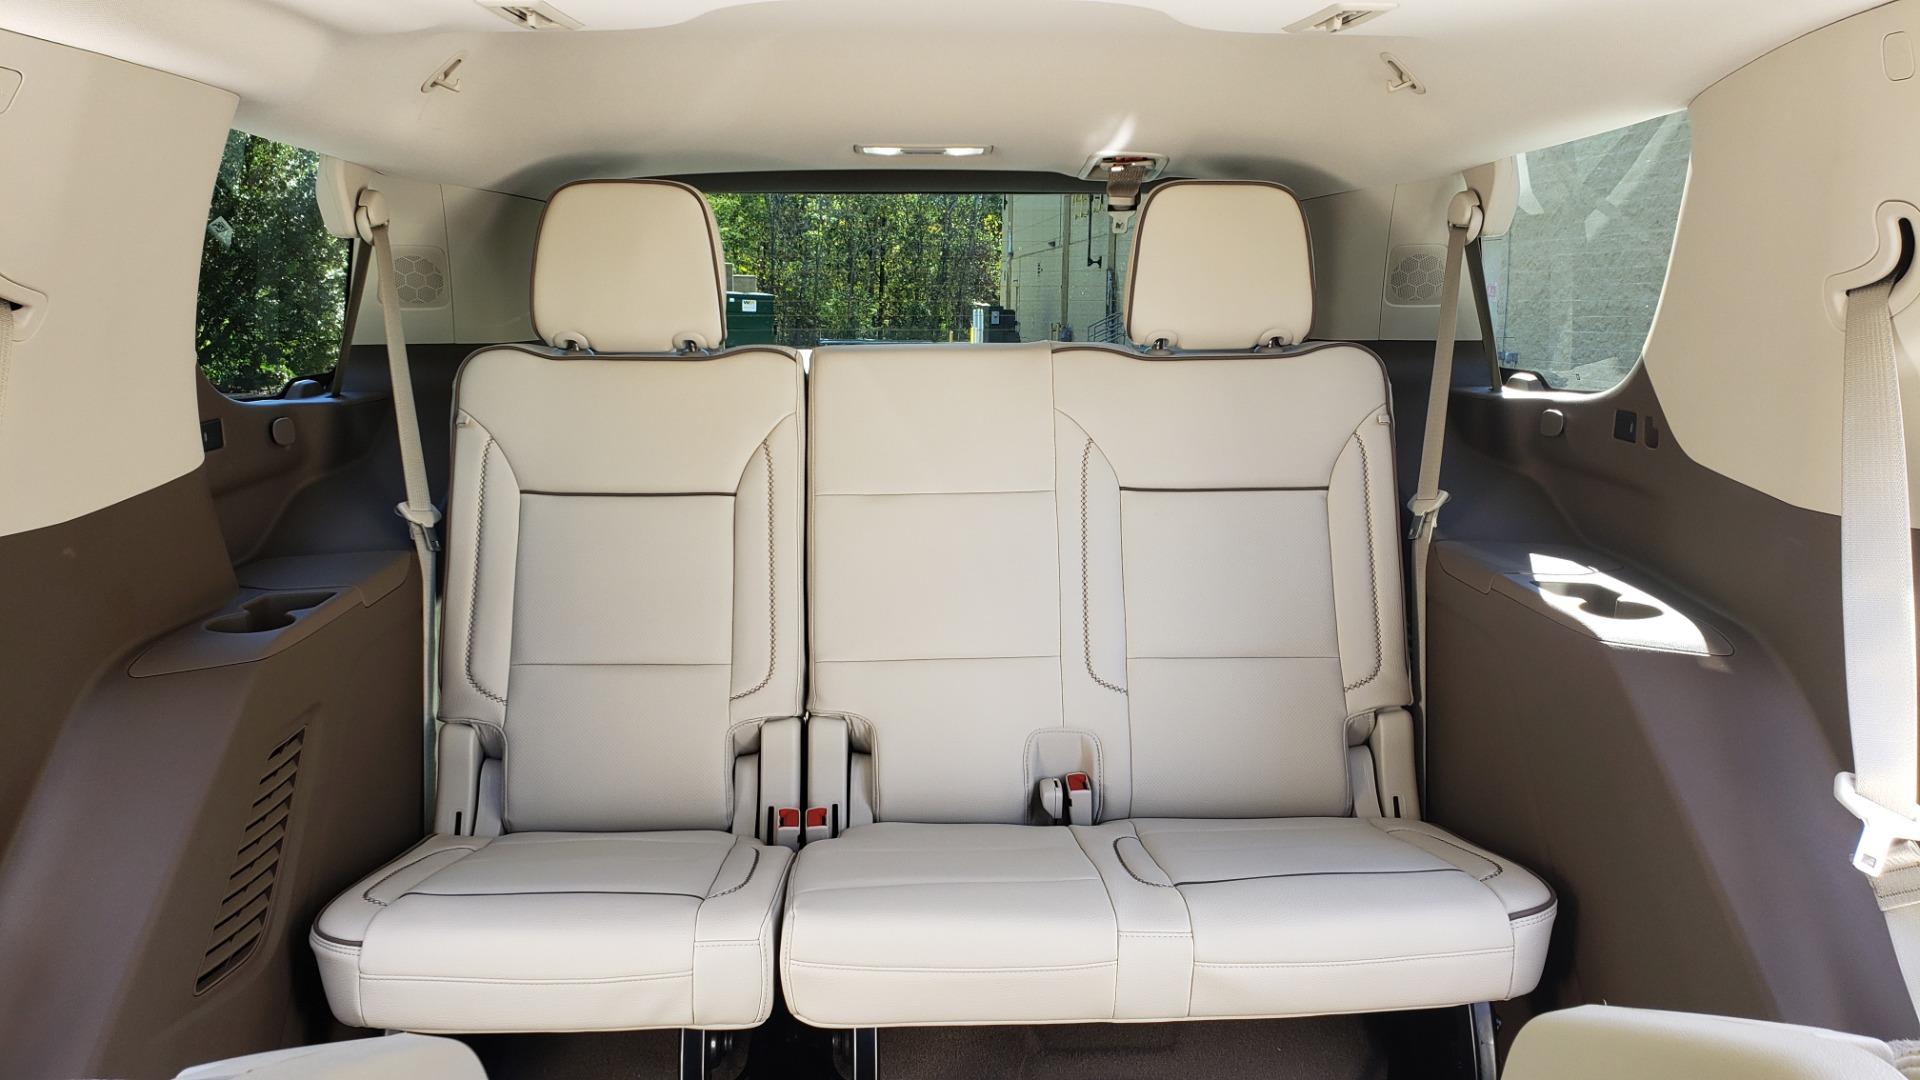 Used 2021 GMC YUKON DENALI PREMIUM 4WD / NAV / ADVANCED TECH / ENTERTAINMENT for sale Sold at Formula Imports in Charlotte NC 28227 80